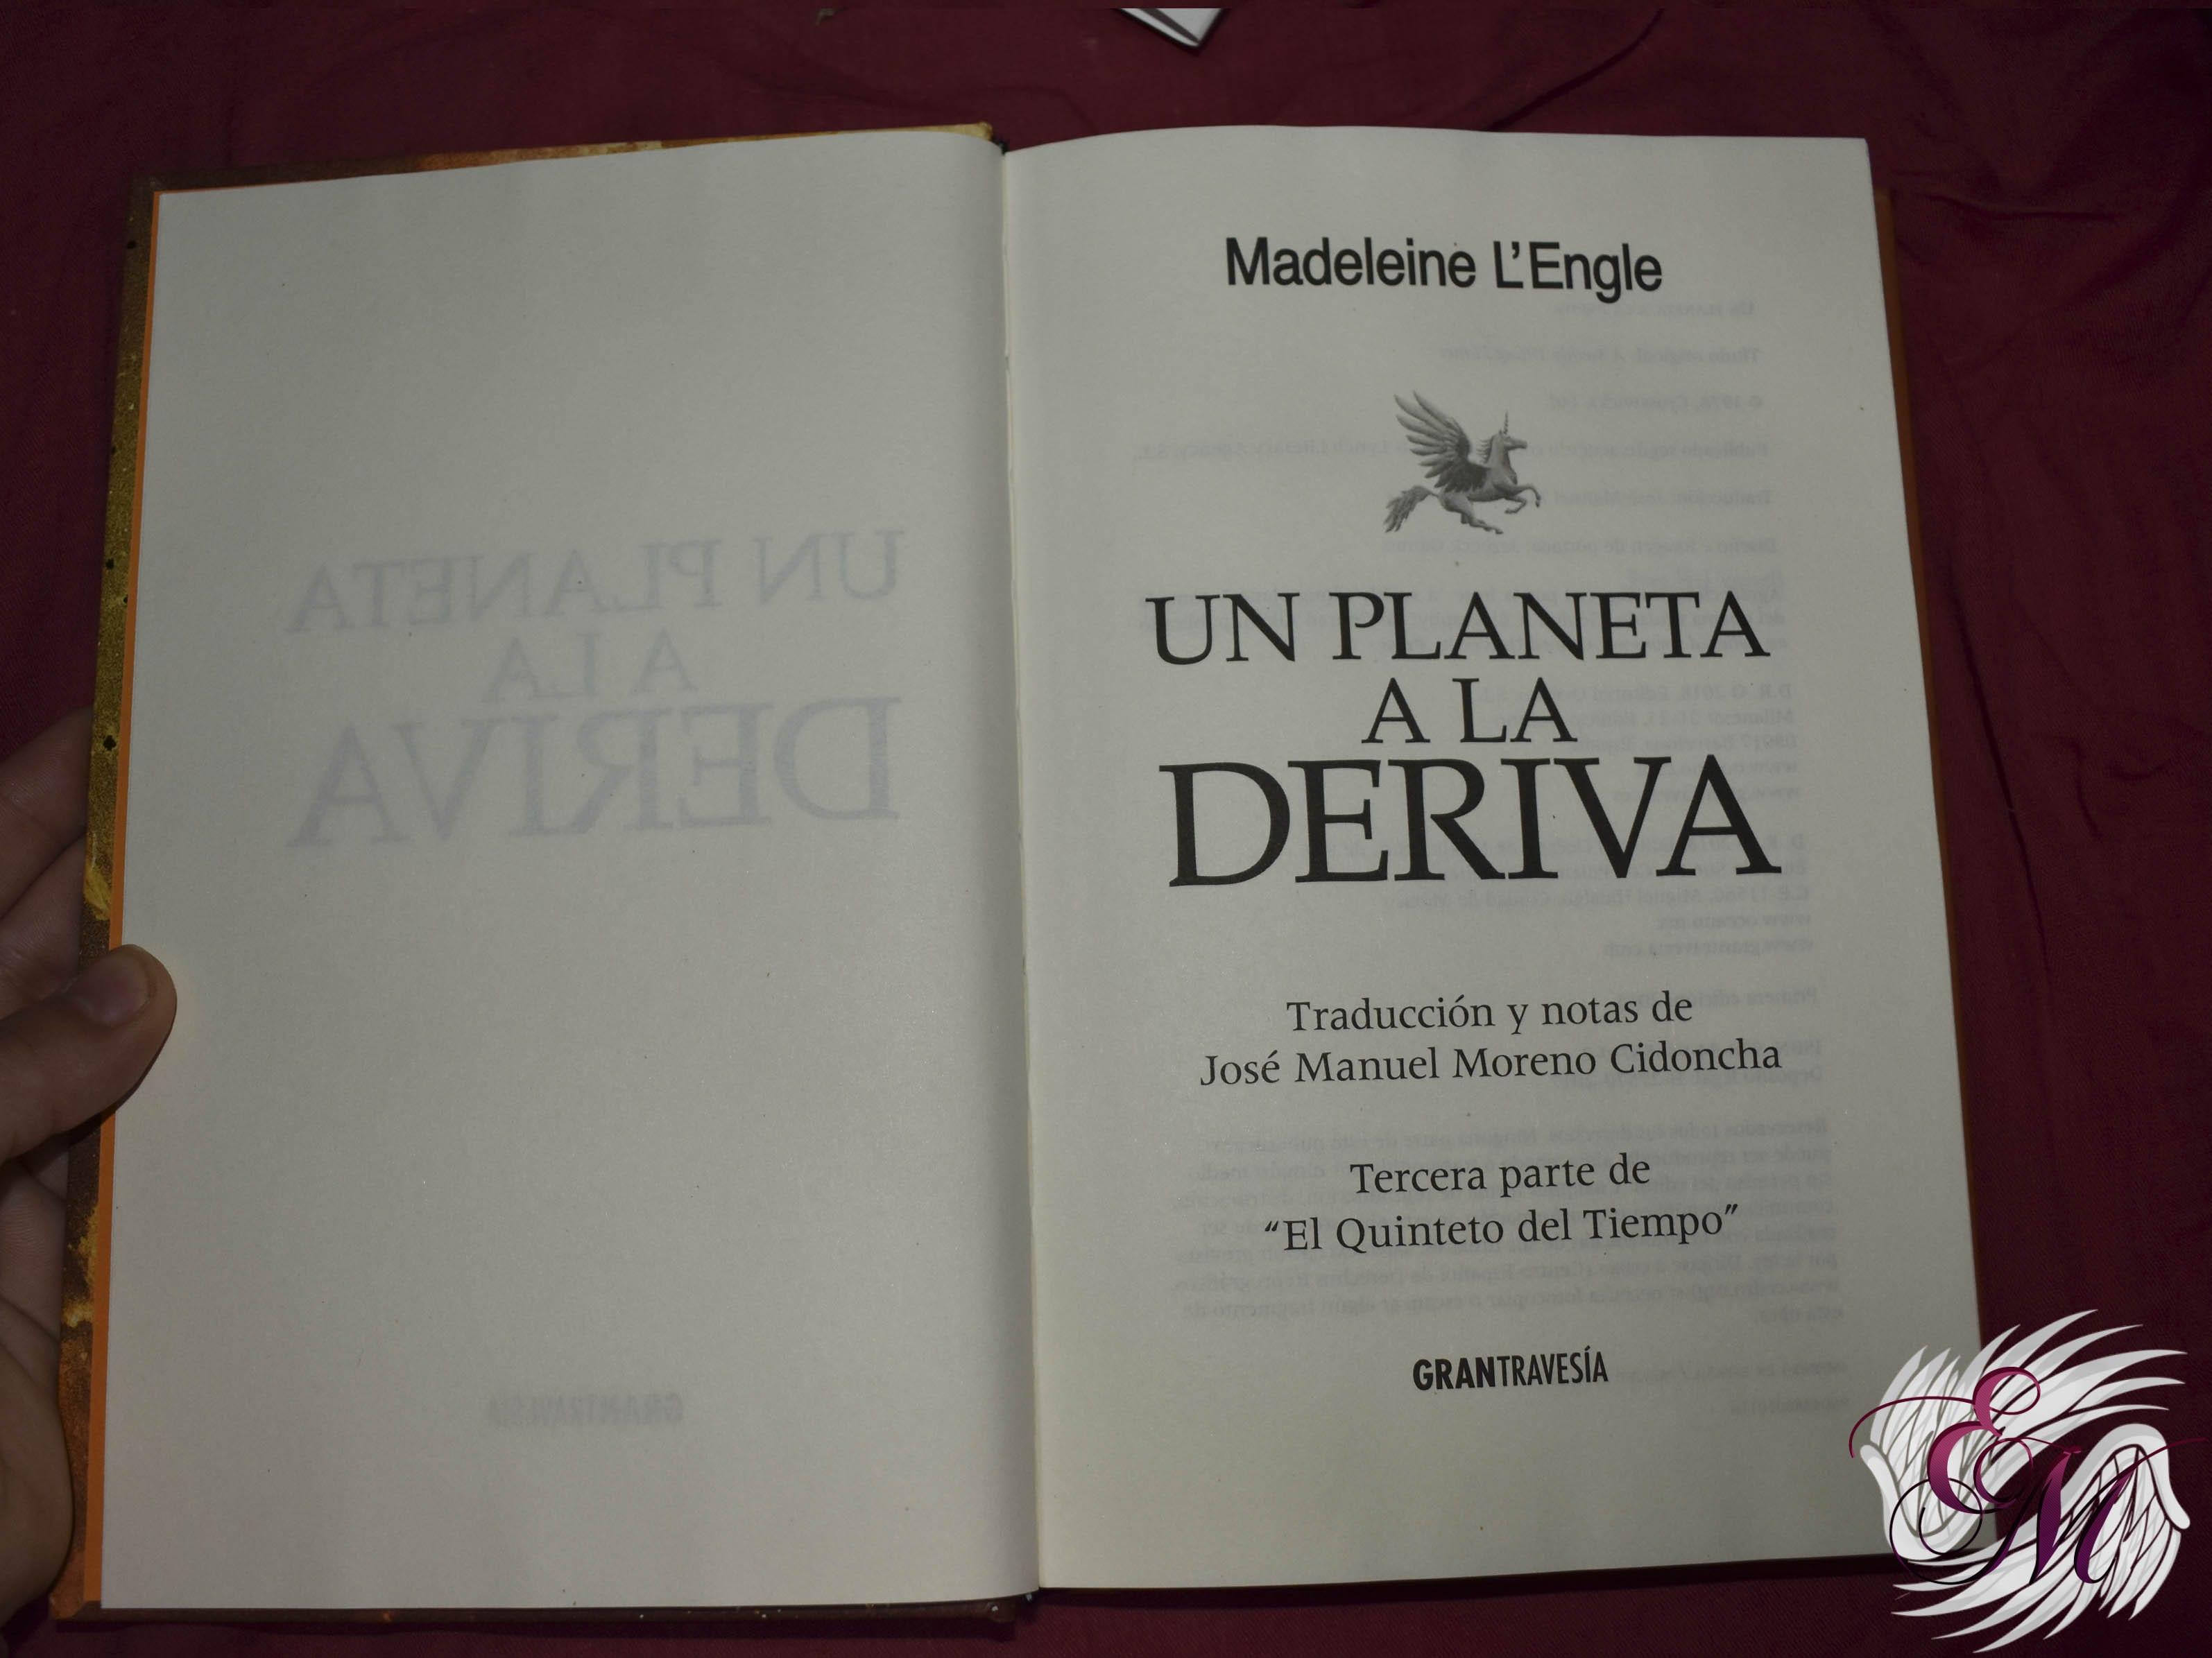 Un planeta a la deriva, de Madeleine L'Engle - Reseña